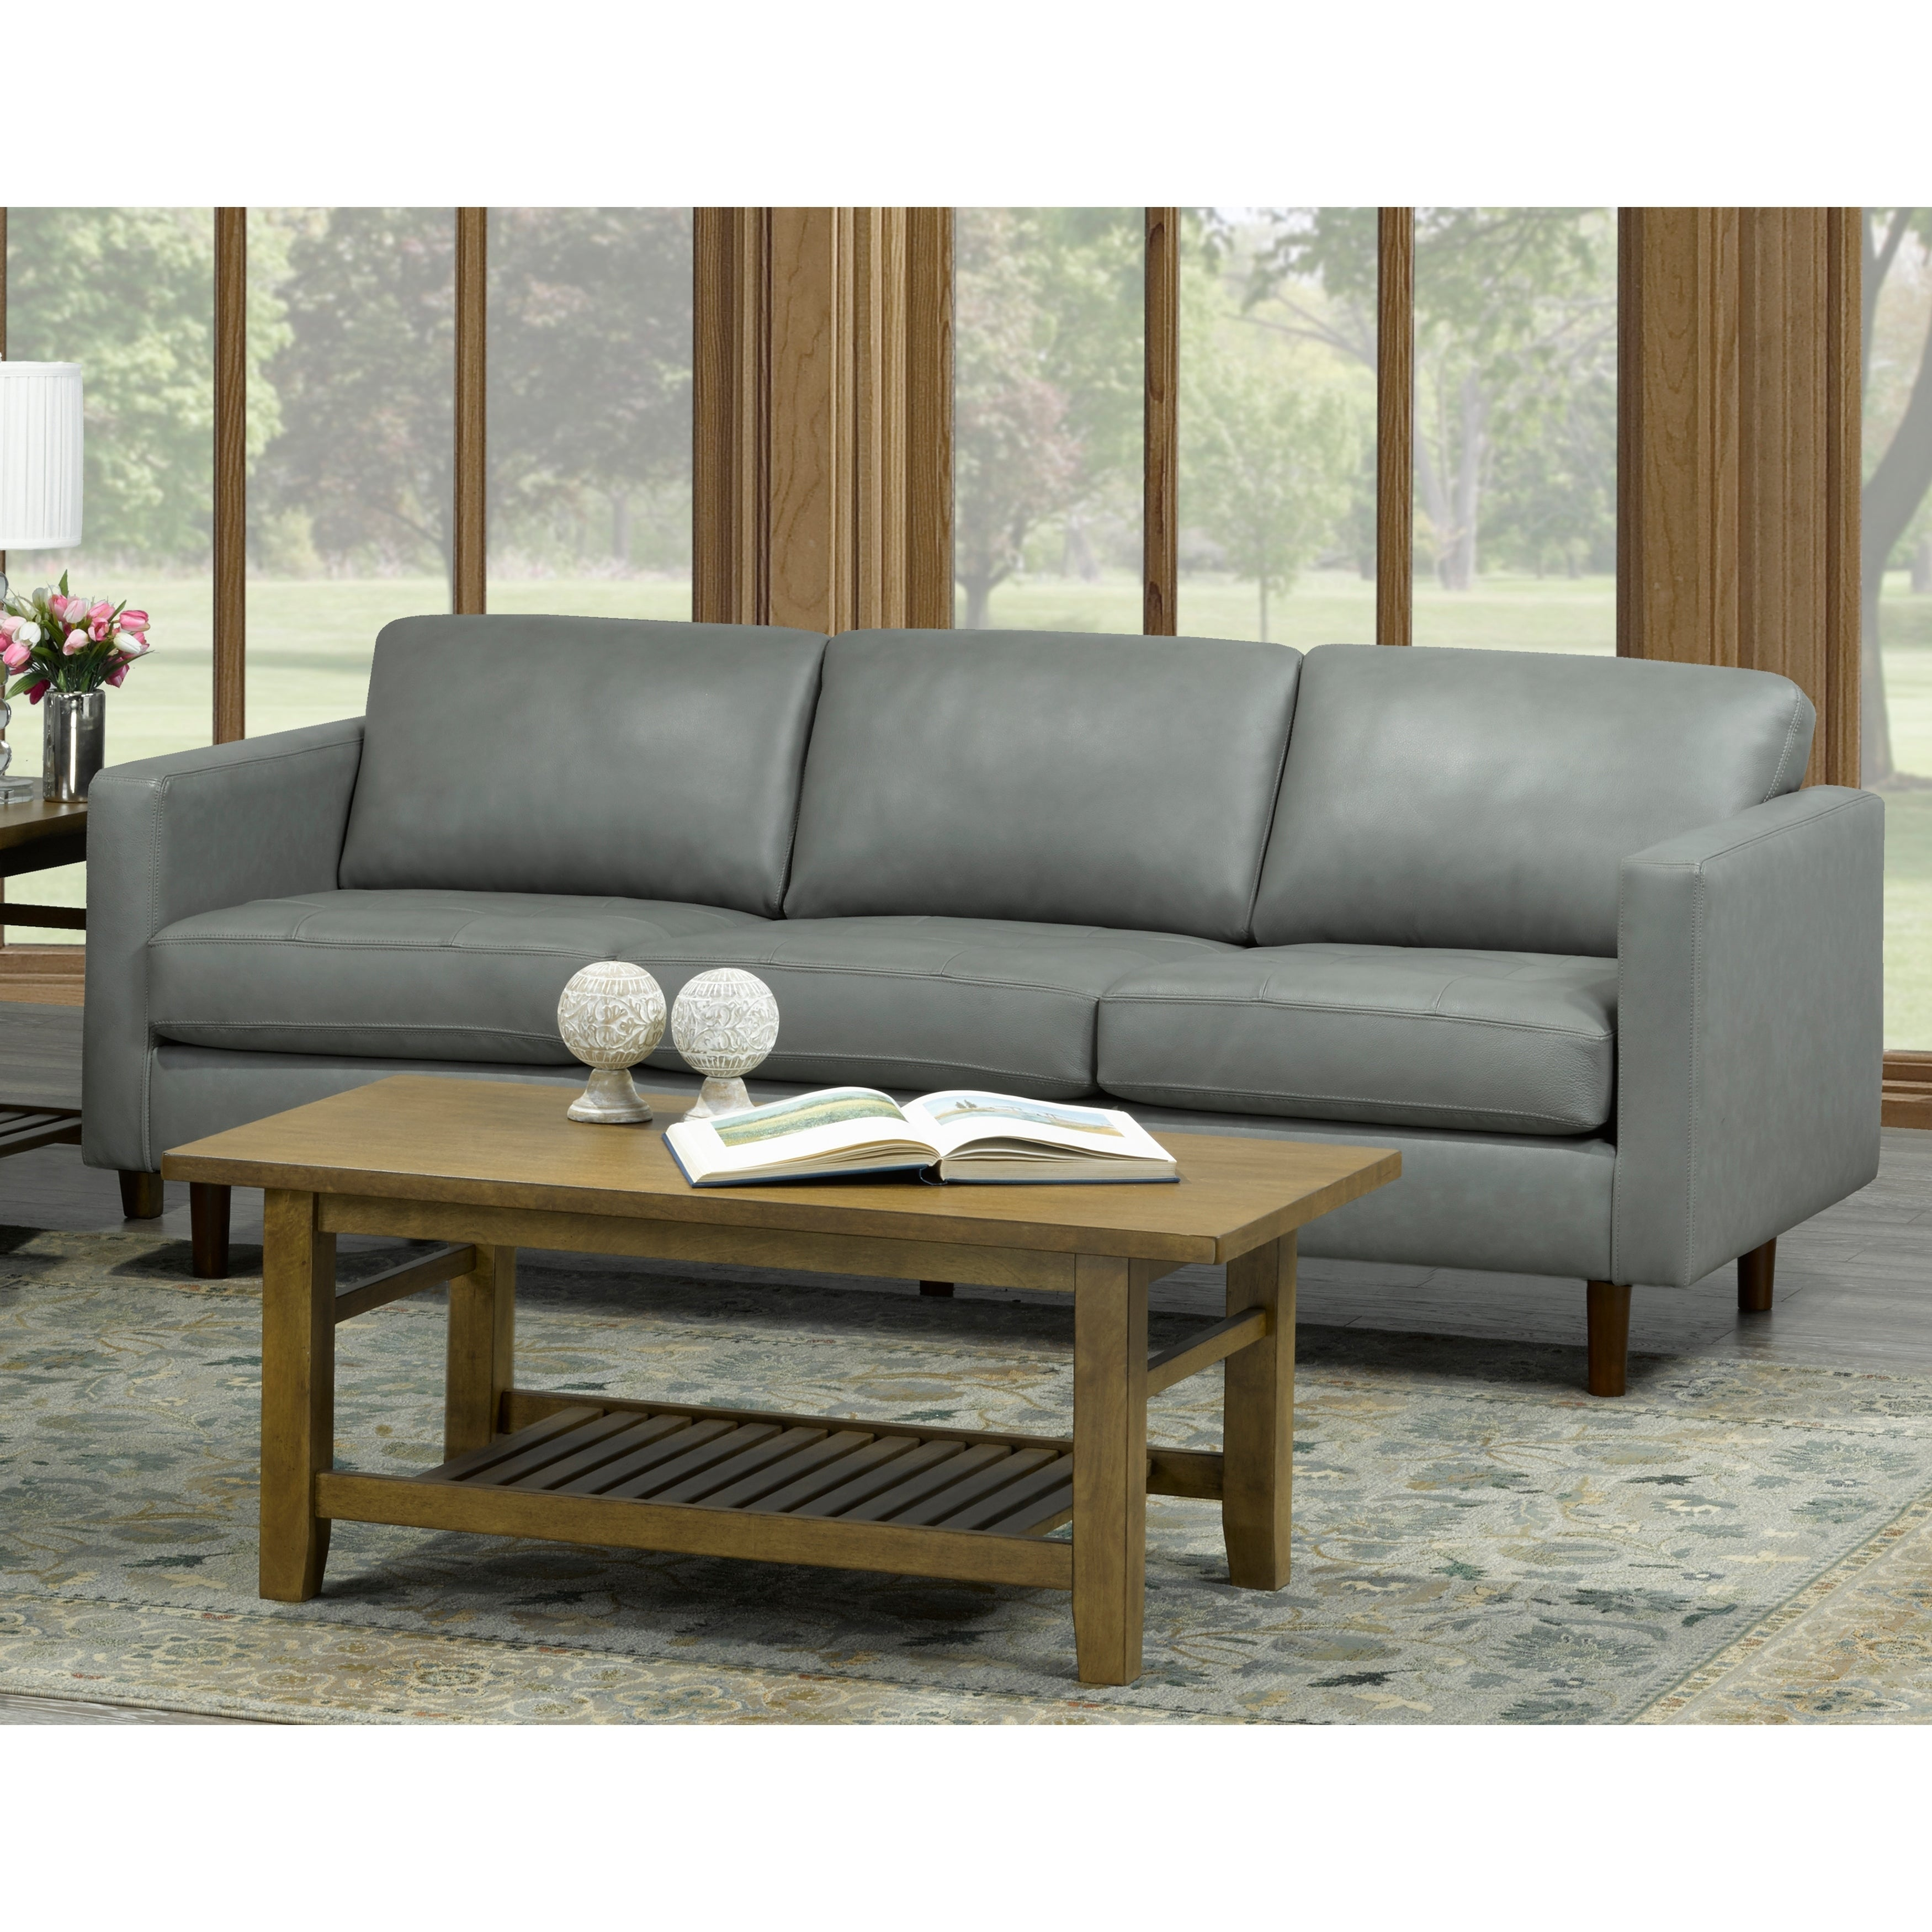 Booker Mid Century Modern Grey Top Grain Italian Leather Tufted Sofa